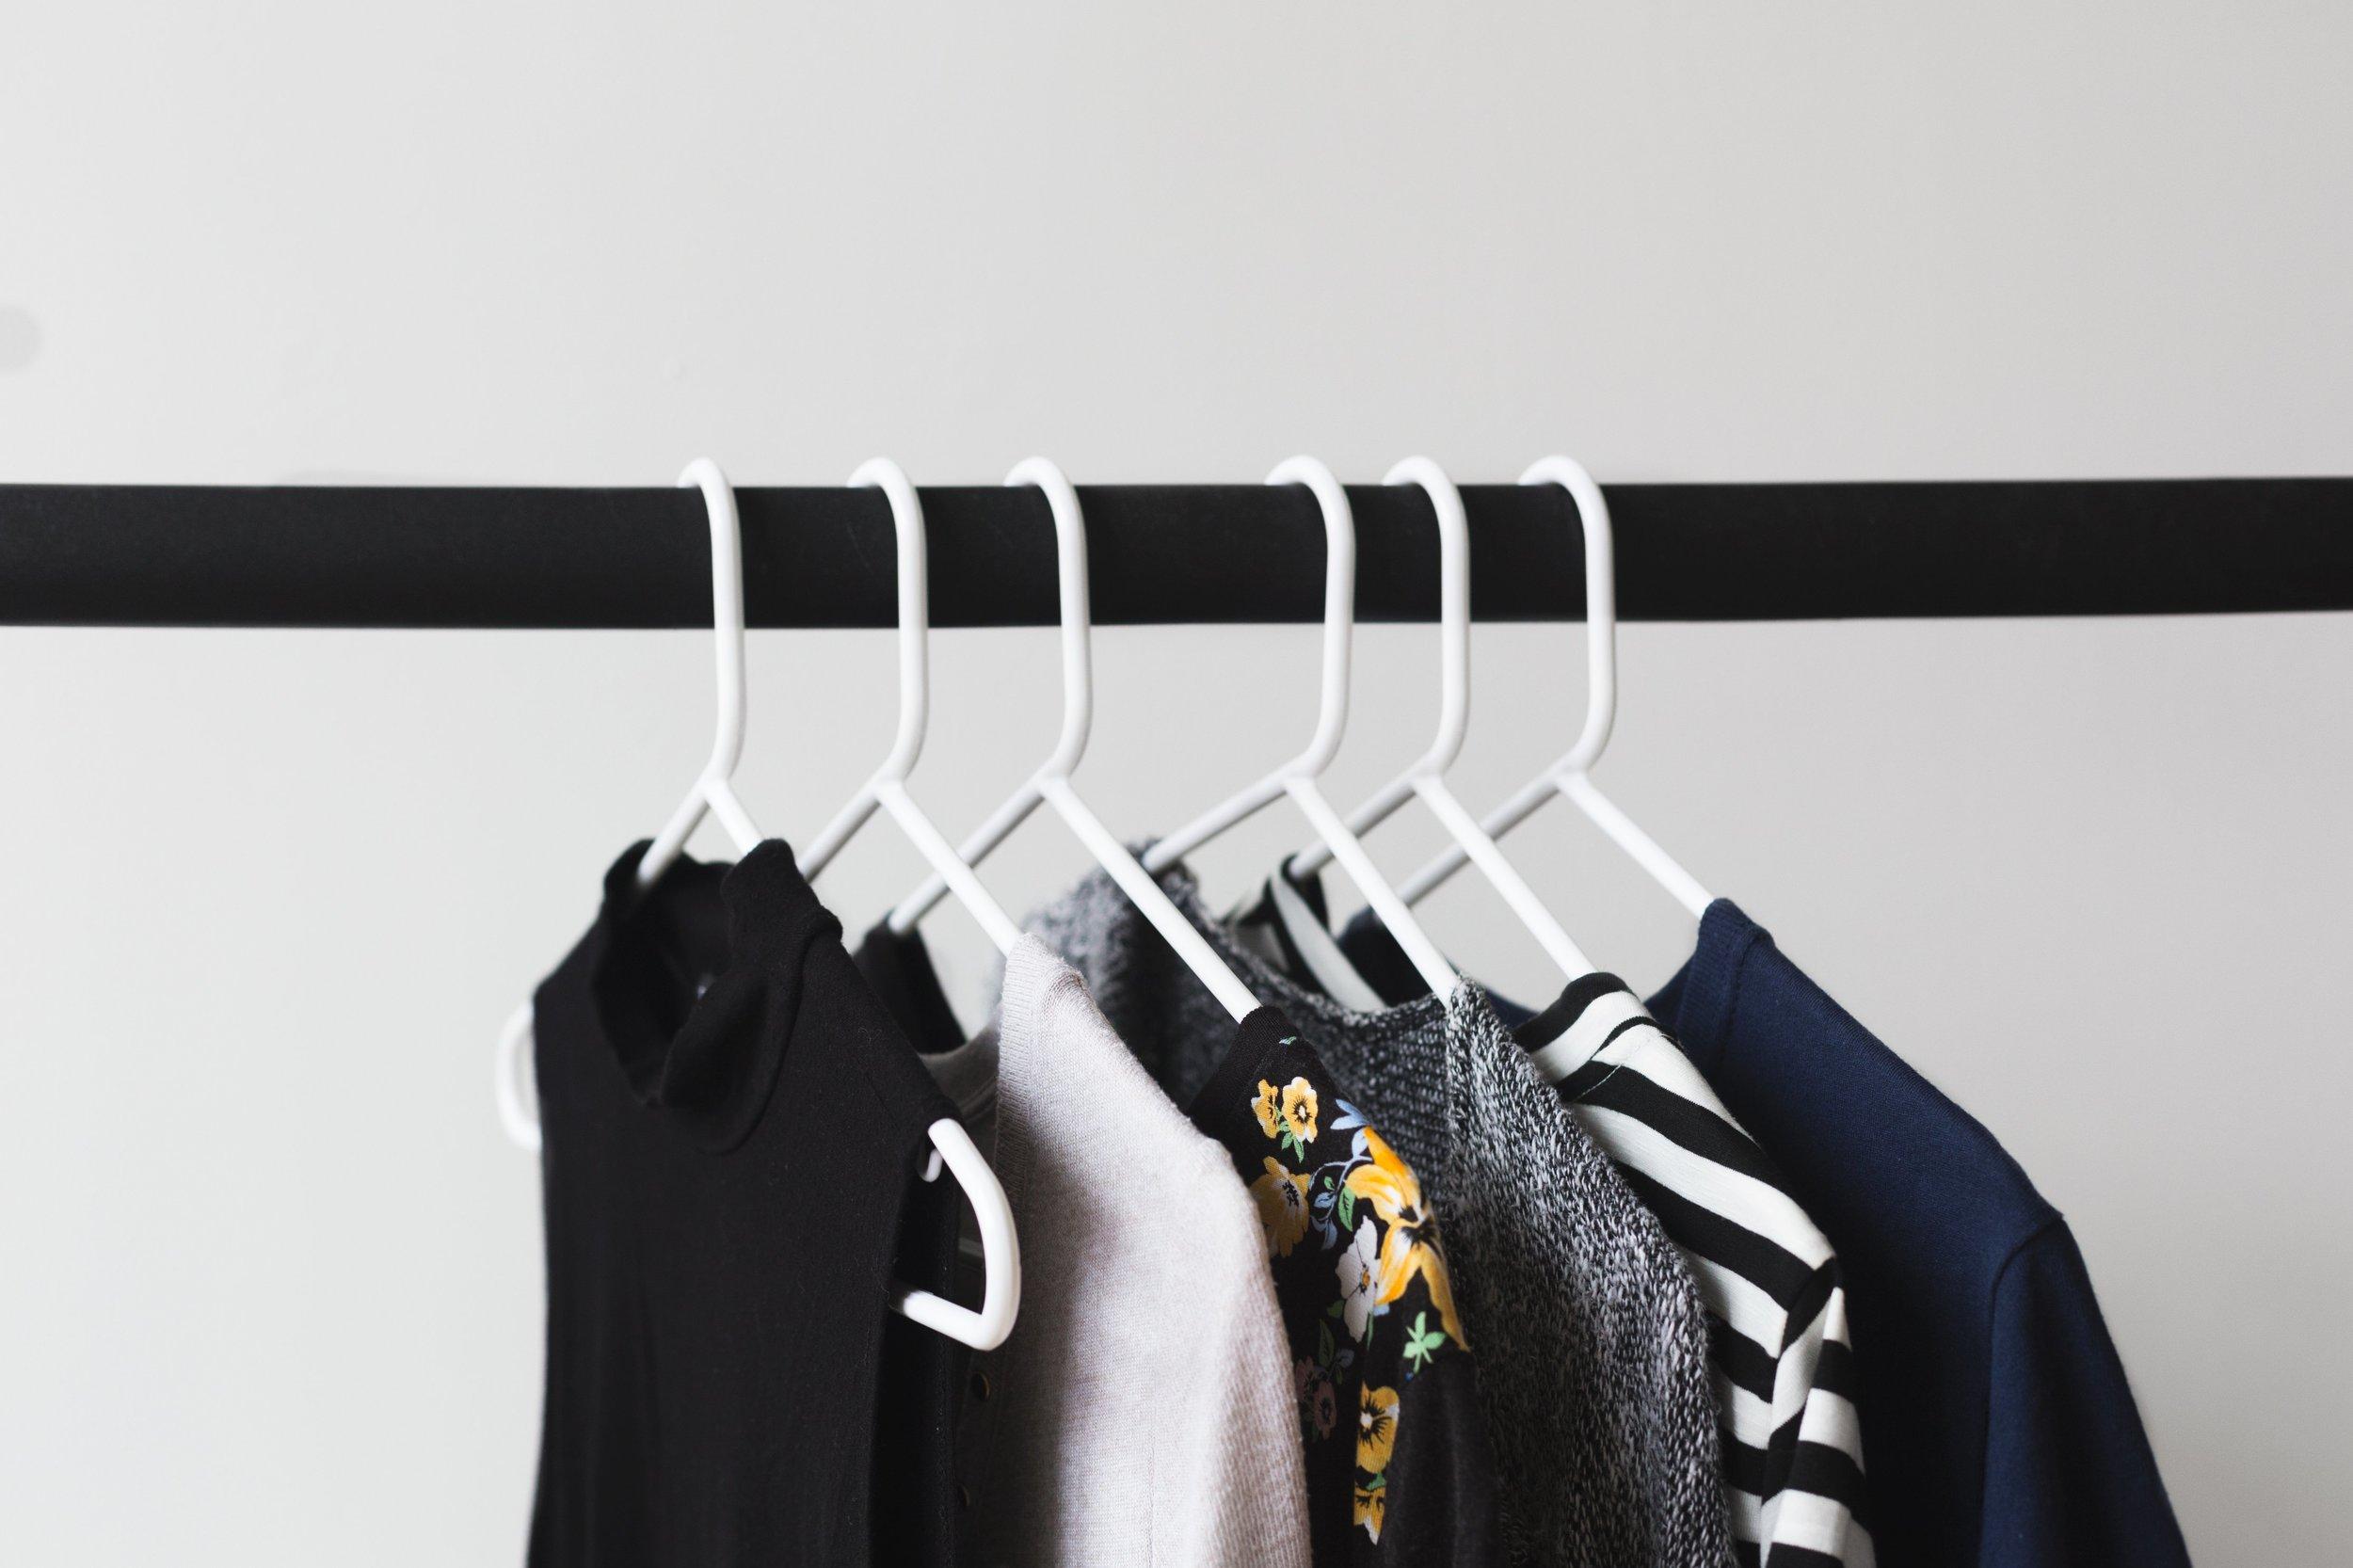 womens-fashion-on-hangers_4460x4460.jpg